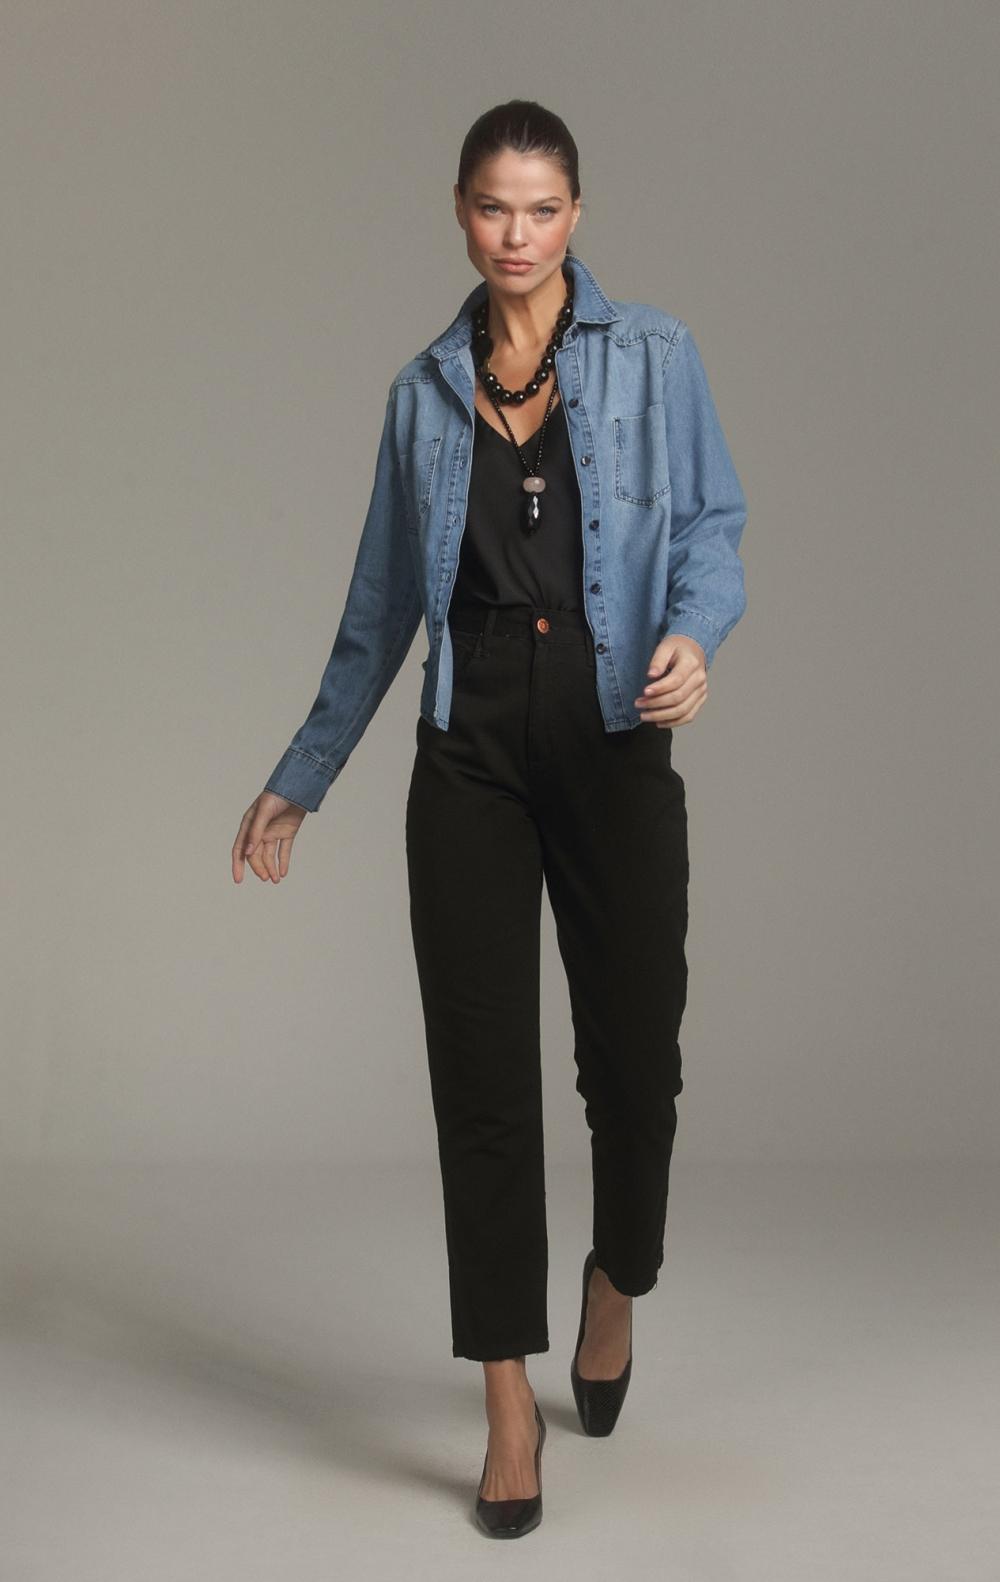 Camisa Jeans - Foto 1